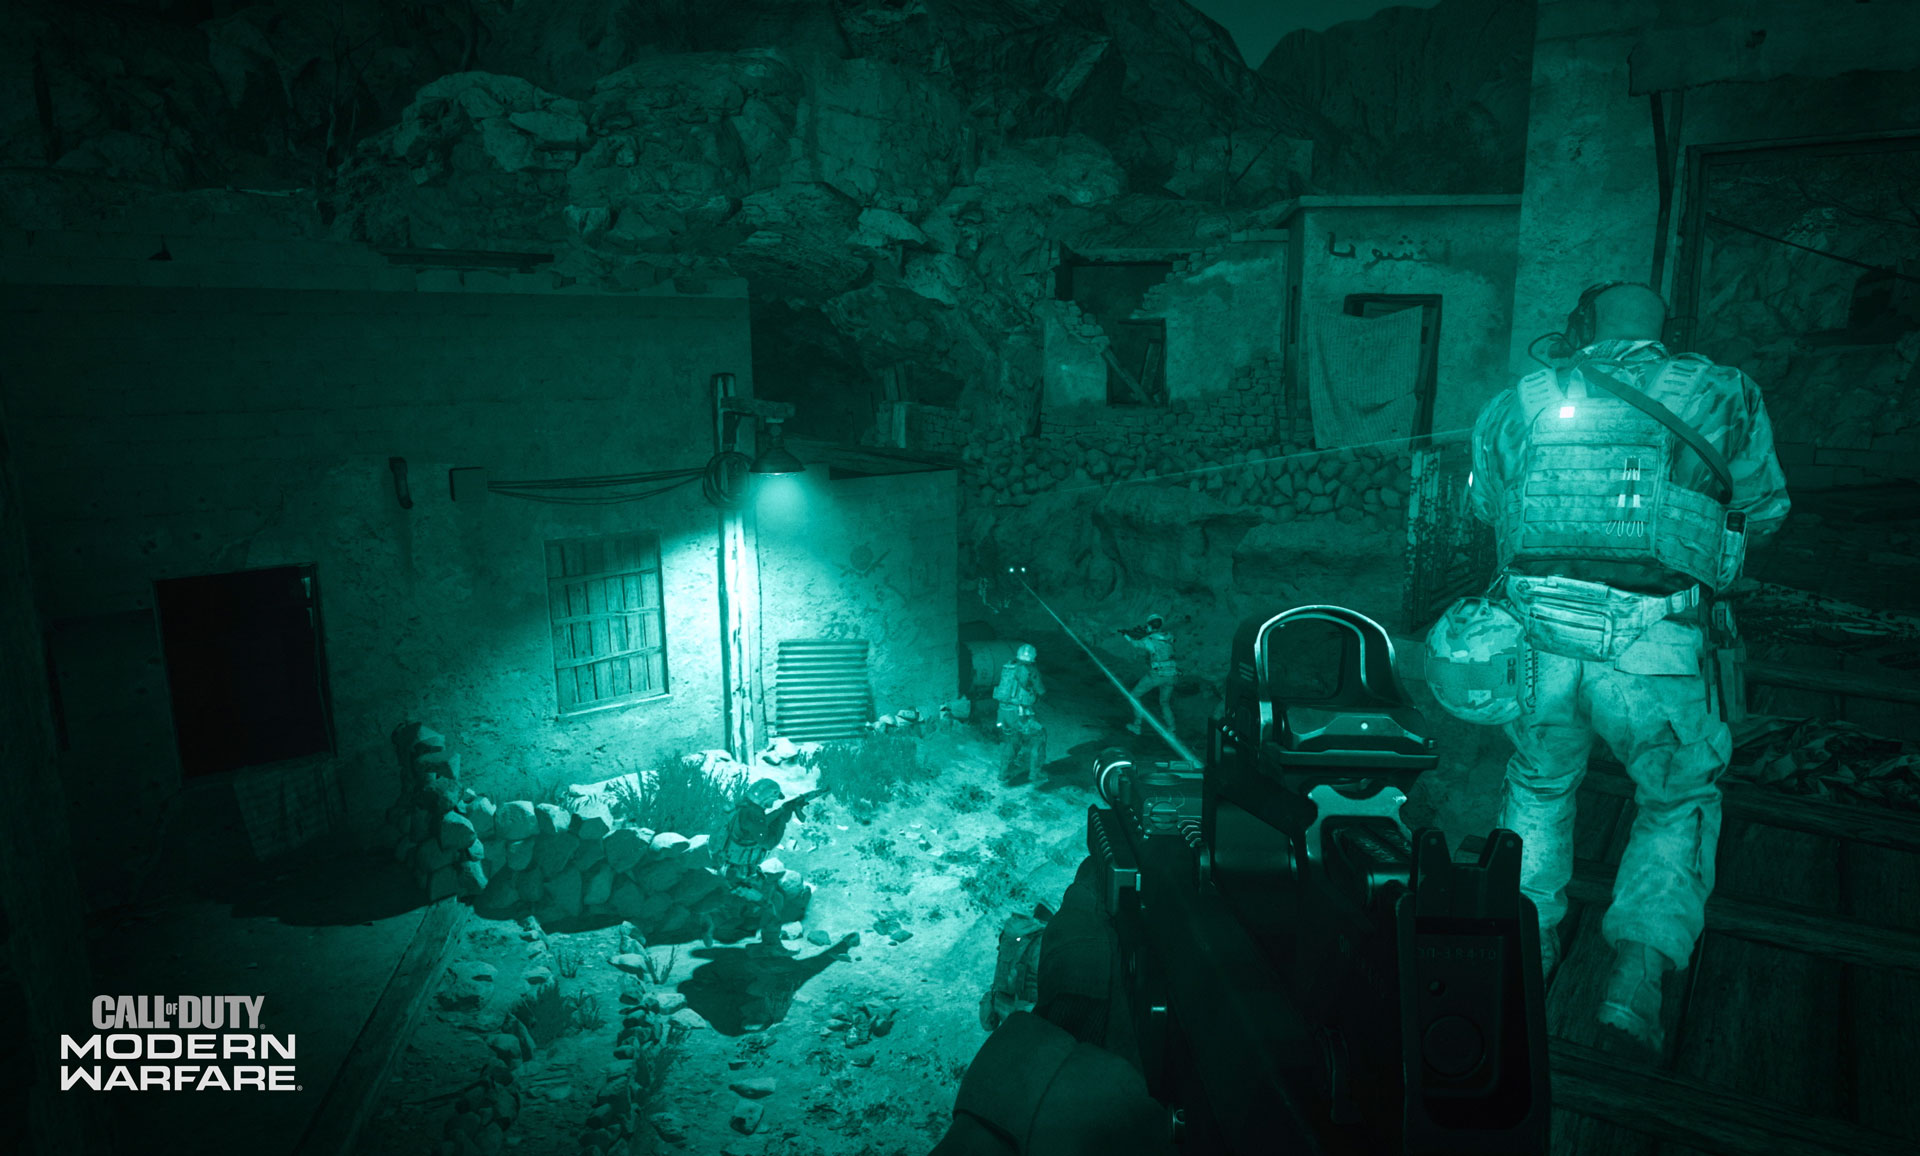 BETA MODES NVG01A - Das erwartet euch in der Call of Duty Modern Warfare Beta